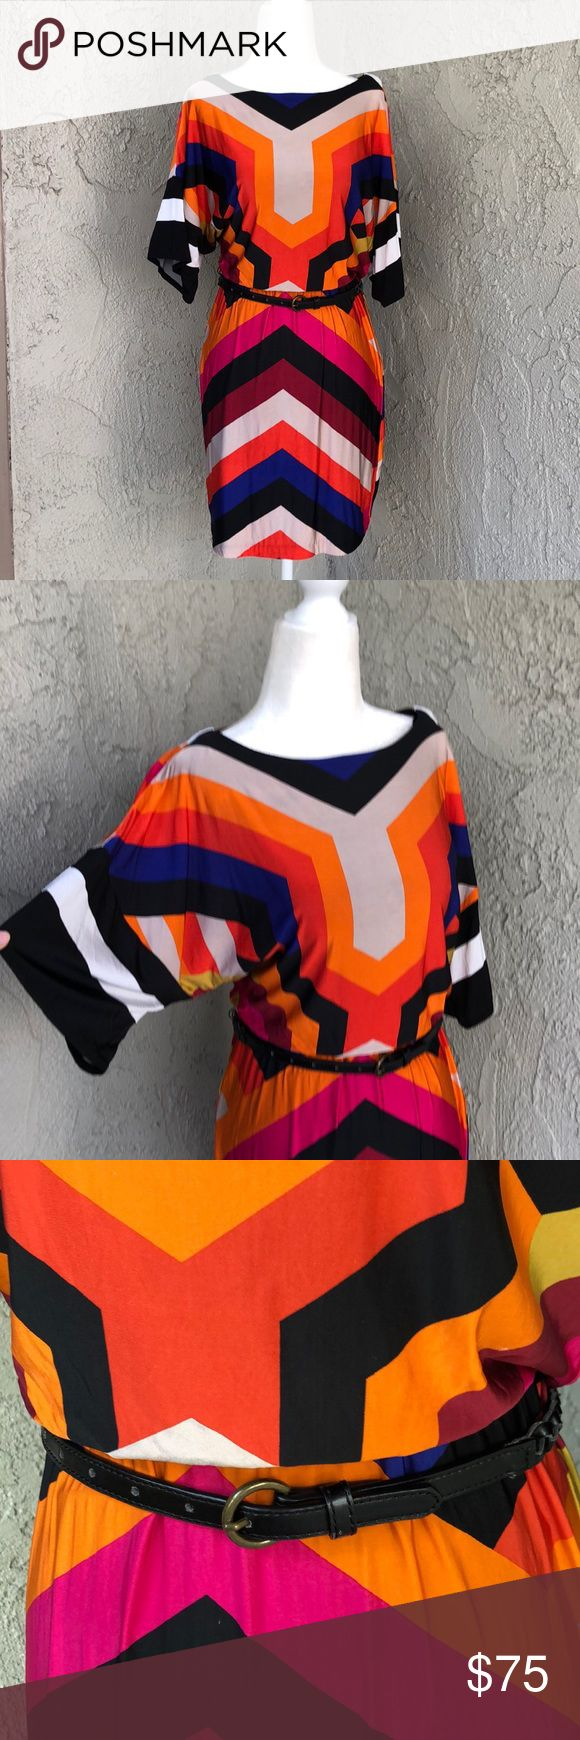 Trina Turk Geometric Print Belted Dolphin Dress 4 This vibrant geometric print d... 1